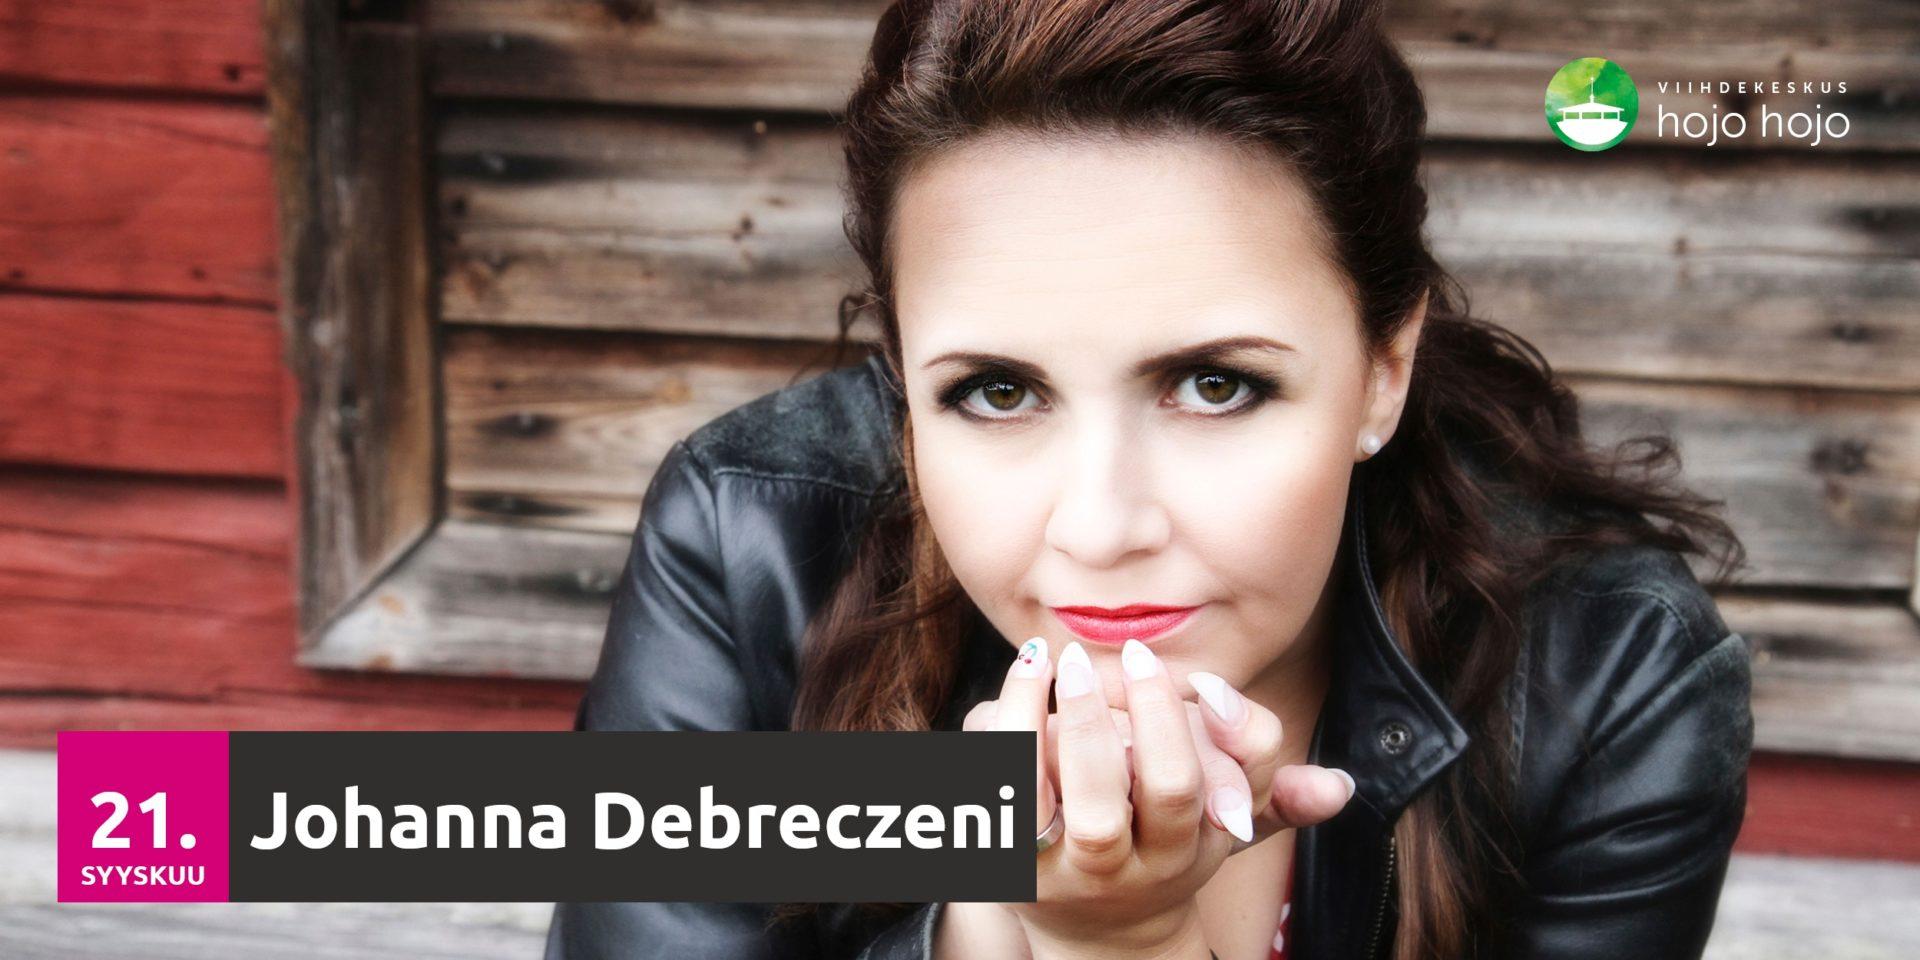 Lauantaina 21.9.2019 Johanna Debreczeni